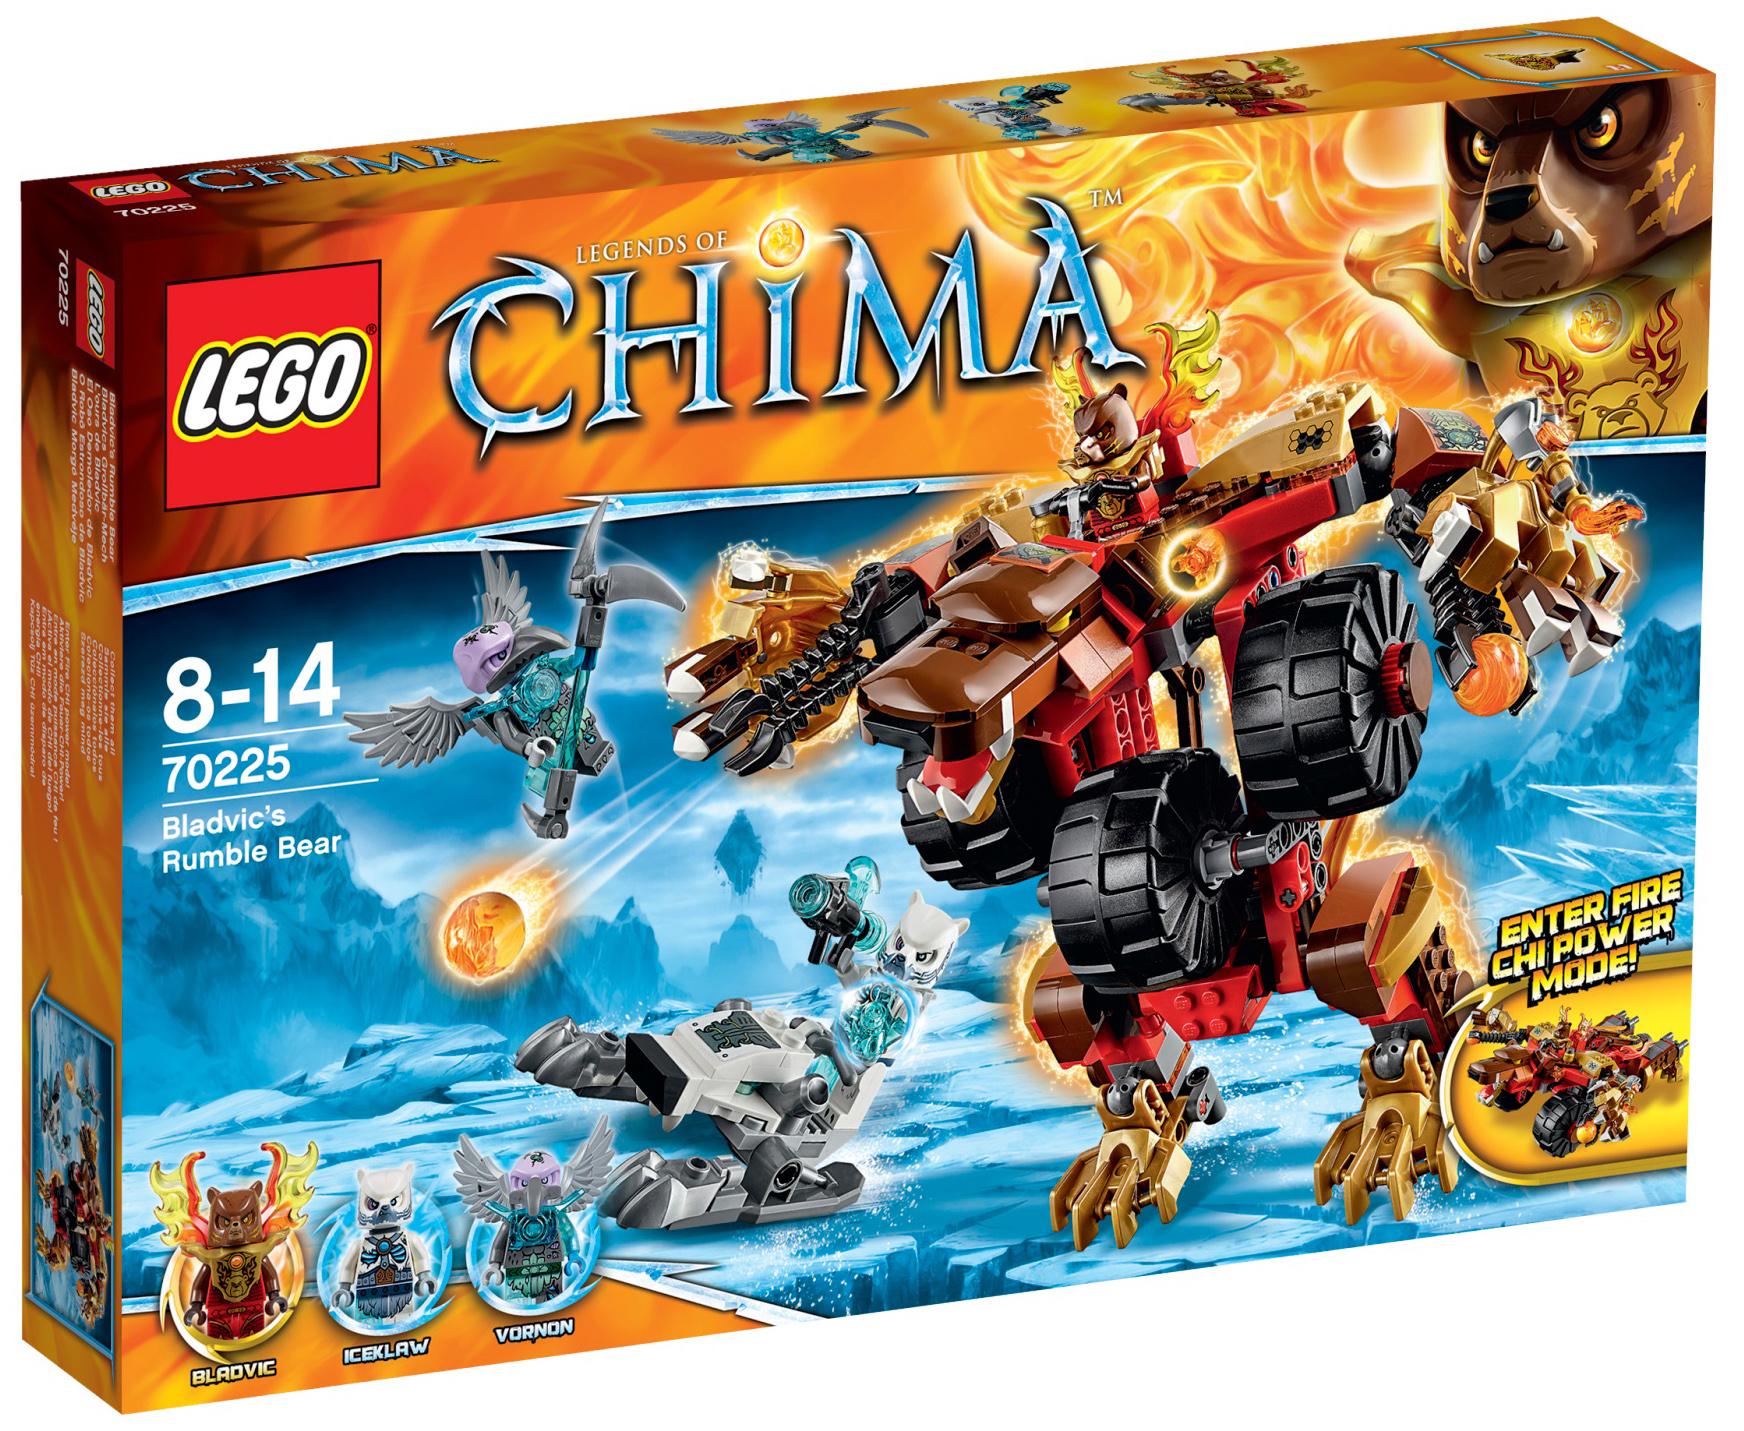 Lego chima 70225 pas cher l 39 ours de bladvic - Image de lego chima ...